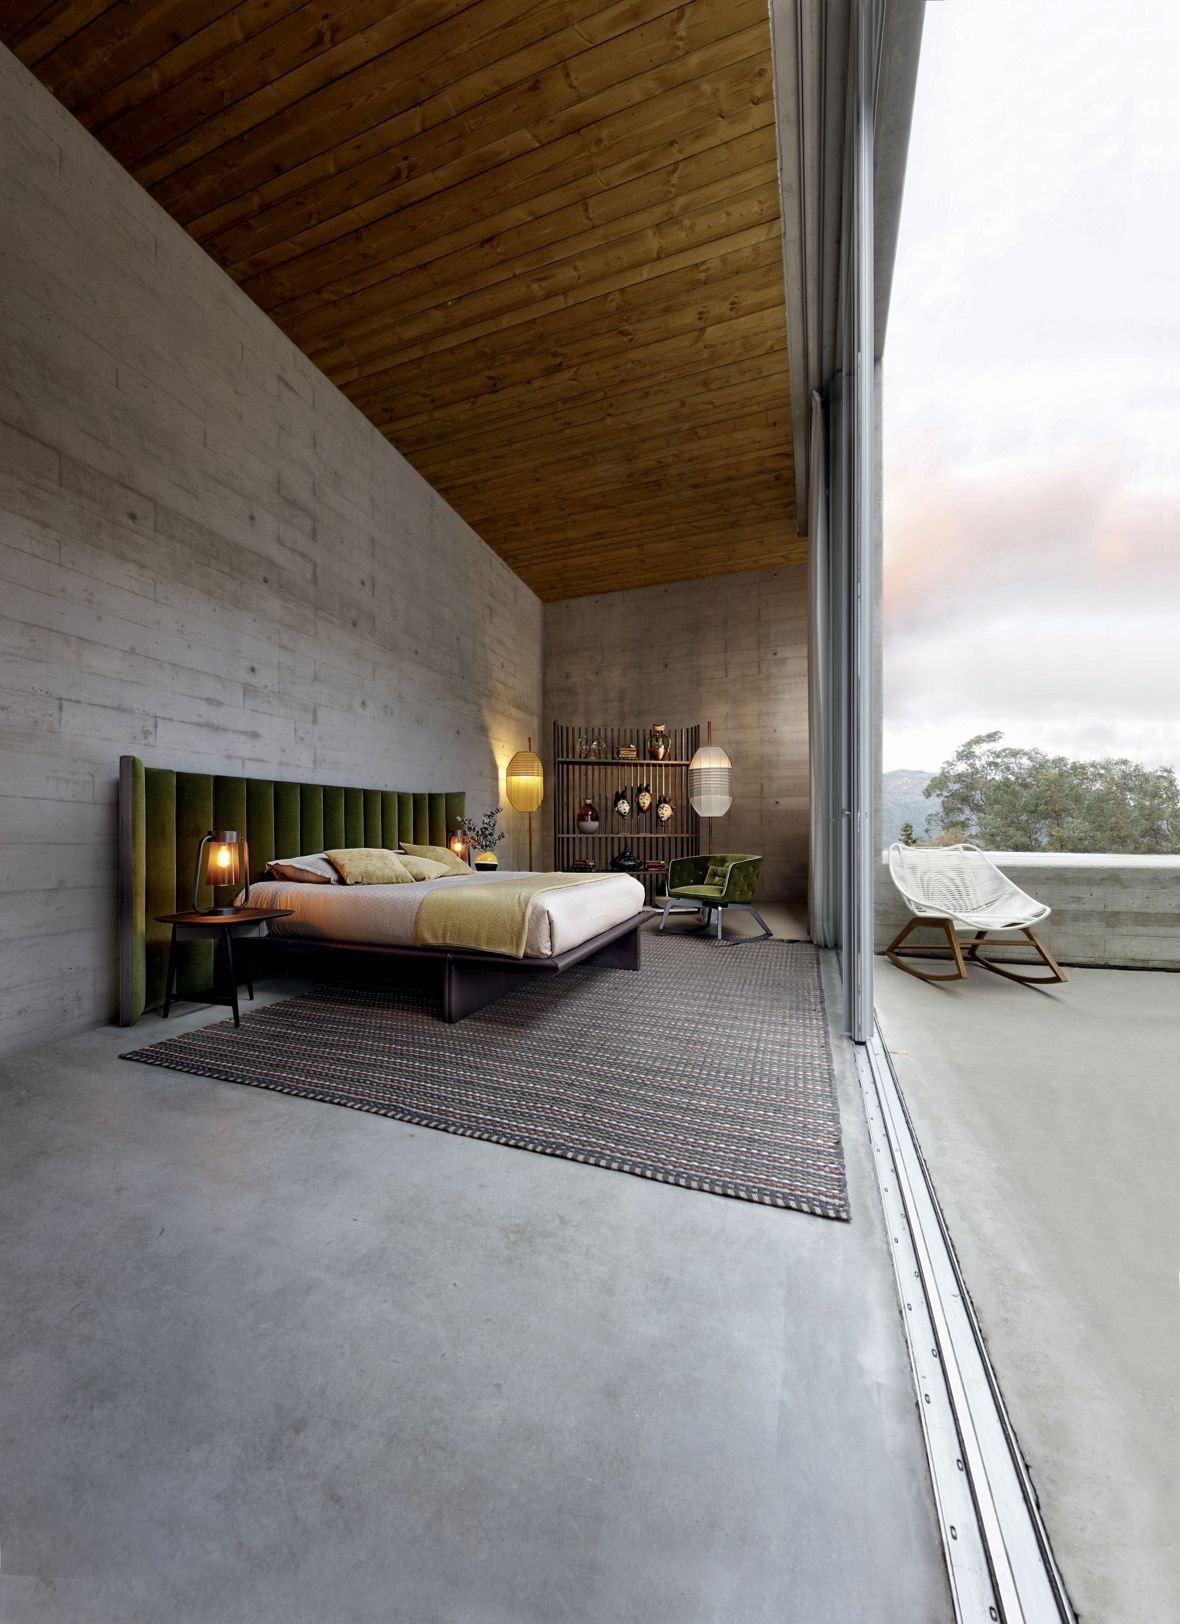 chevet octet roche bobois. Black Bedroom Furniture Sets. Home Design Ideas